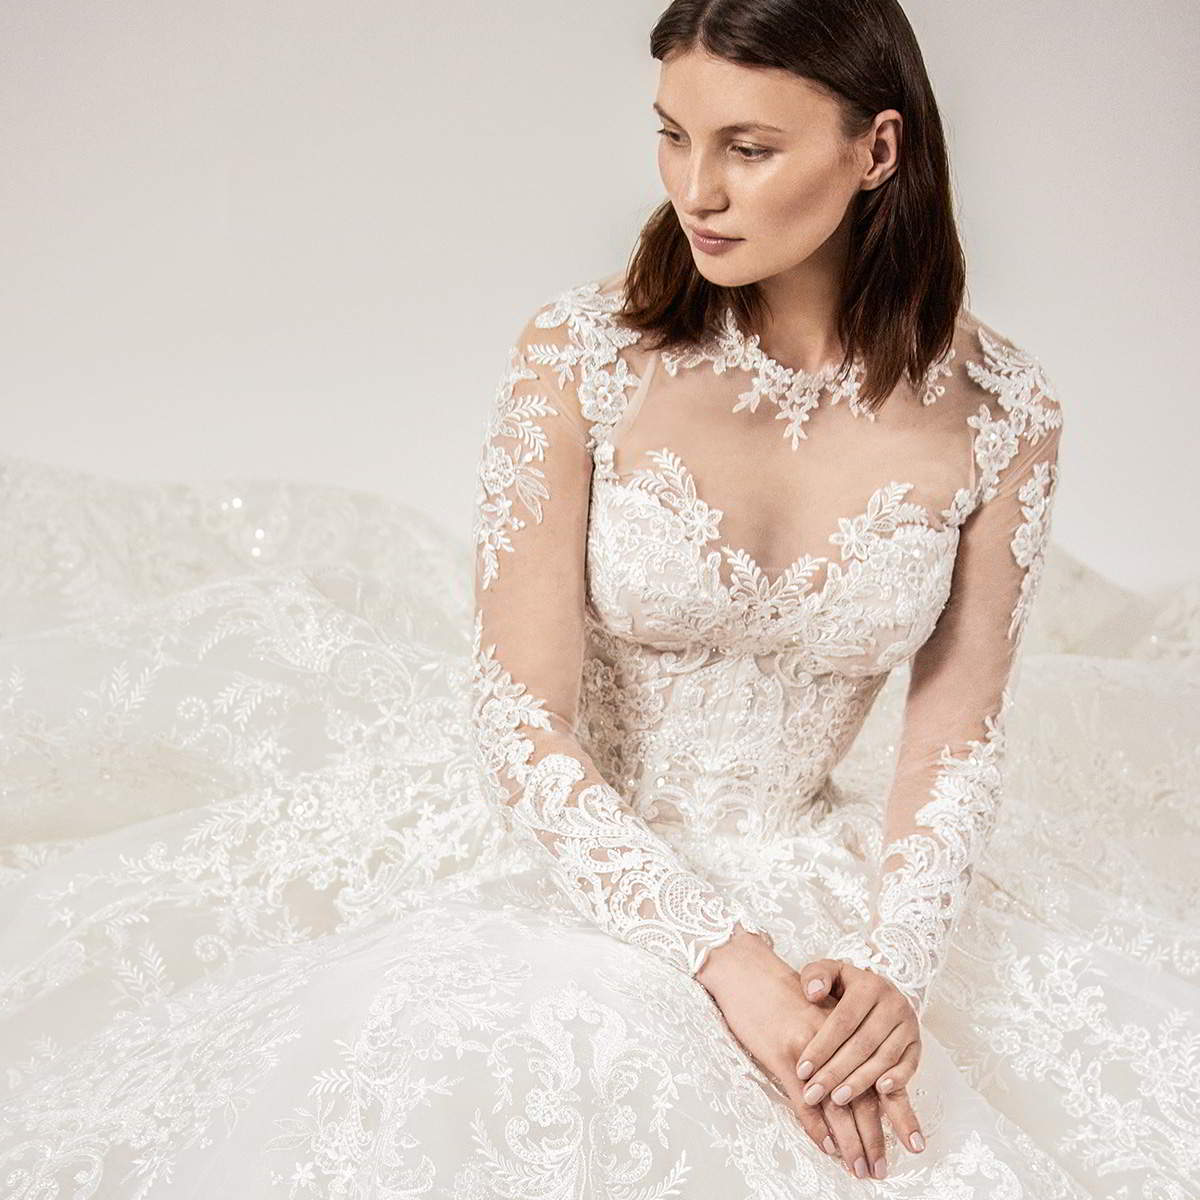 rivini rita vinieris spring 2021 bridal collection featured on wedding inspirasi thumbnail